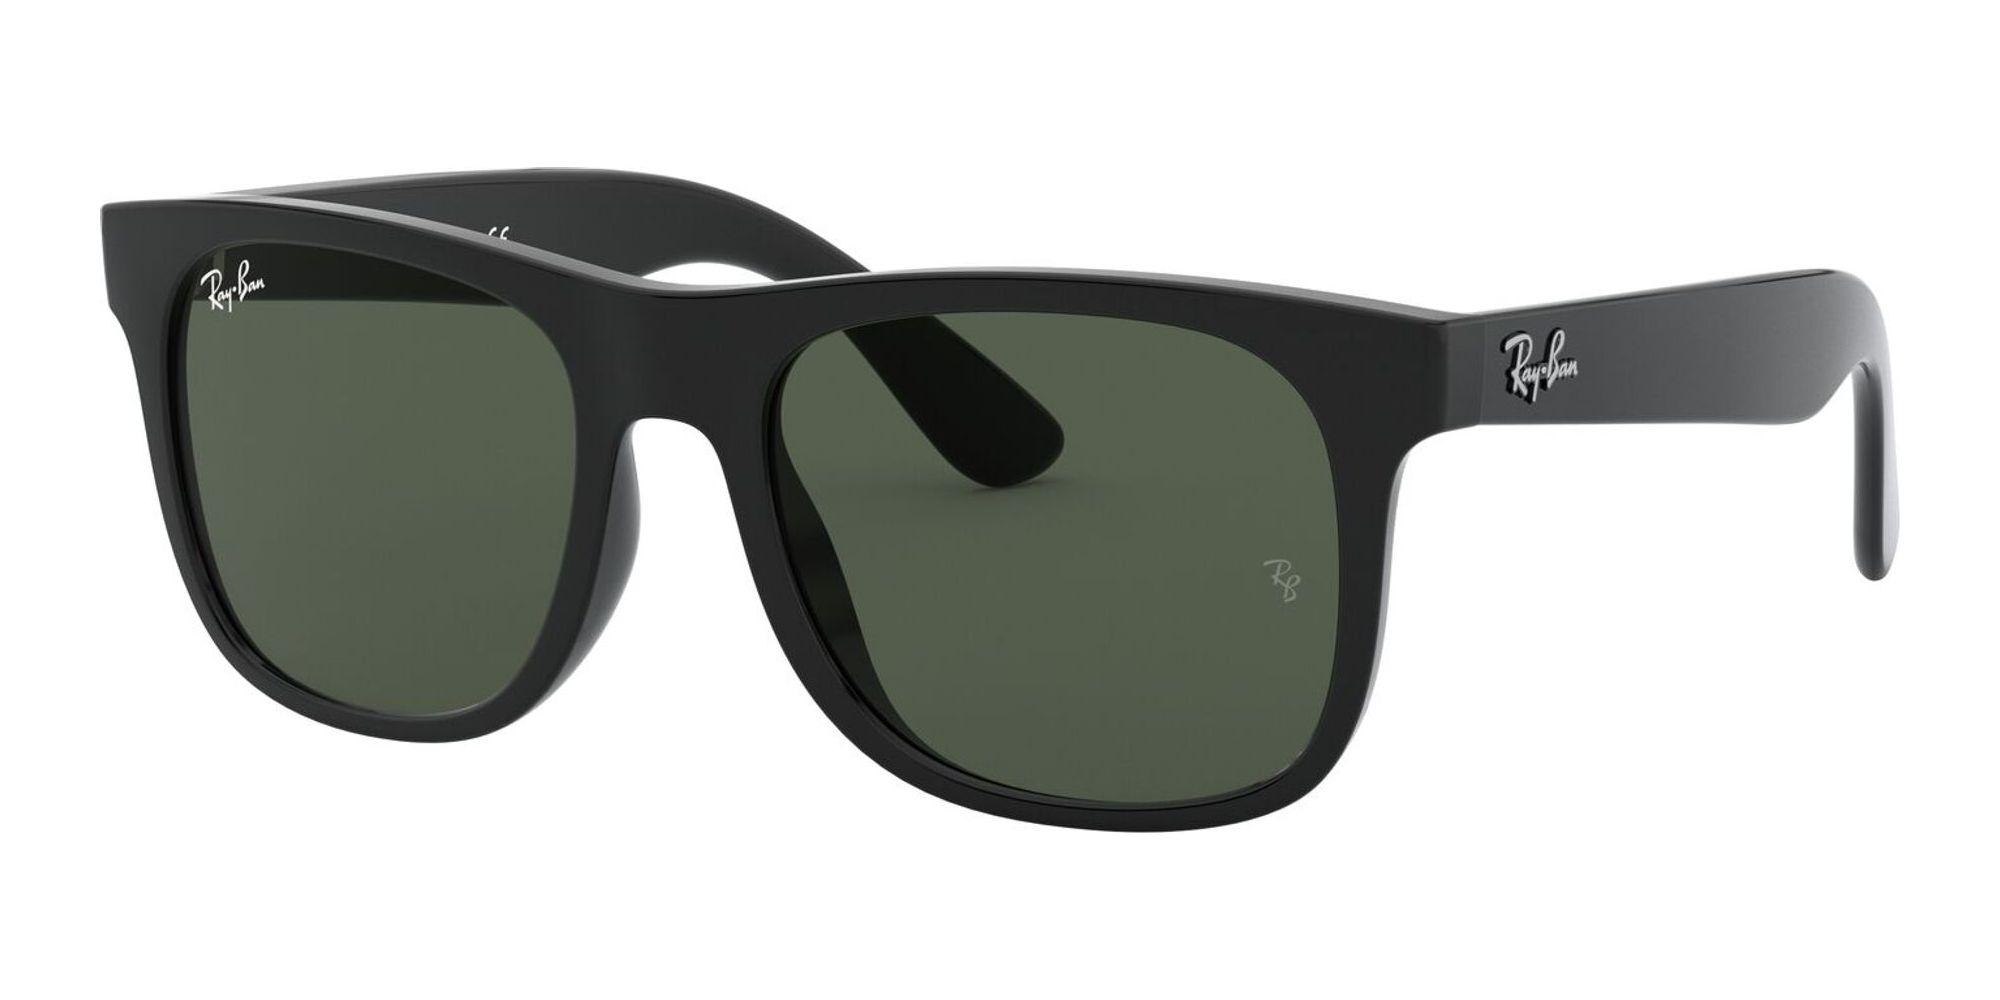 Ray-Ban sunglasses JUNIOR RJ 9069S